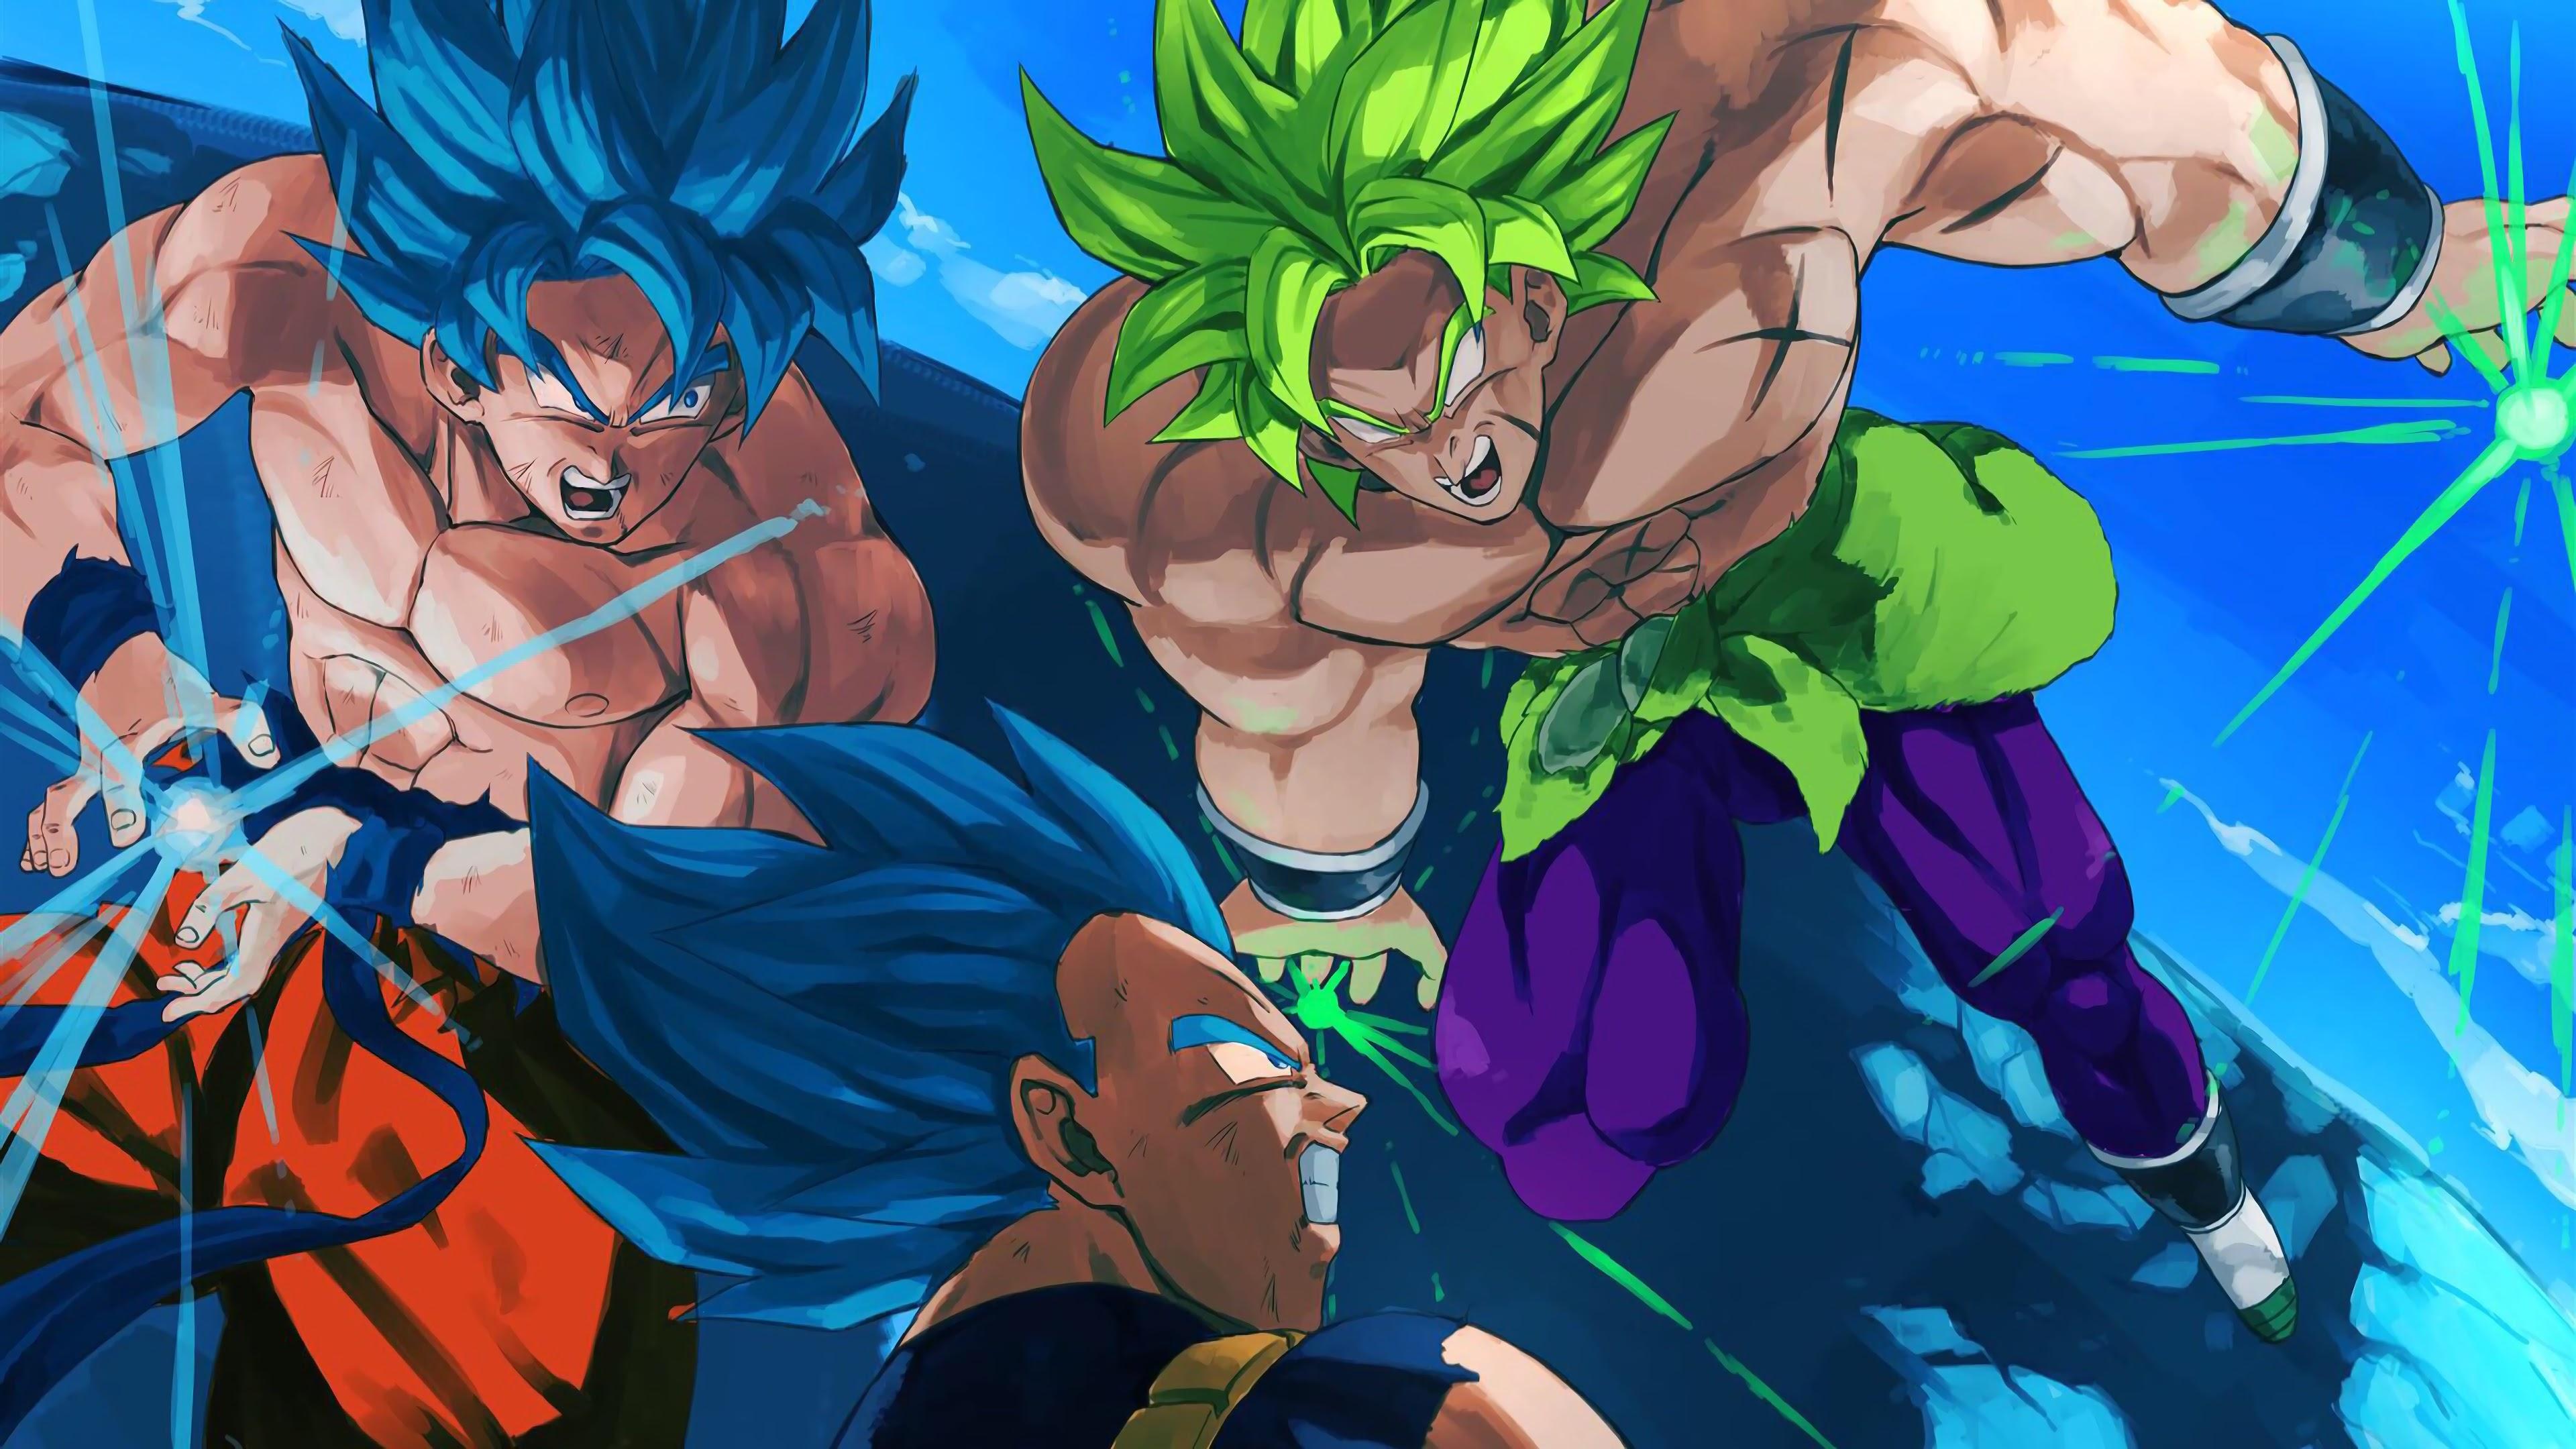 Dragon Ball Super Broly Goku Vegeta 4k 3840x2160 23 Wallpaper